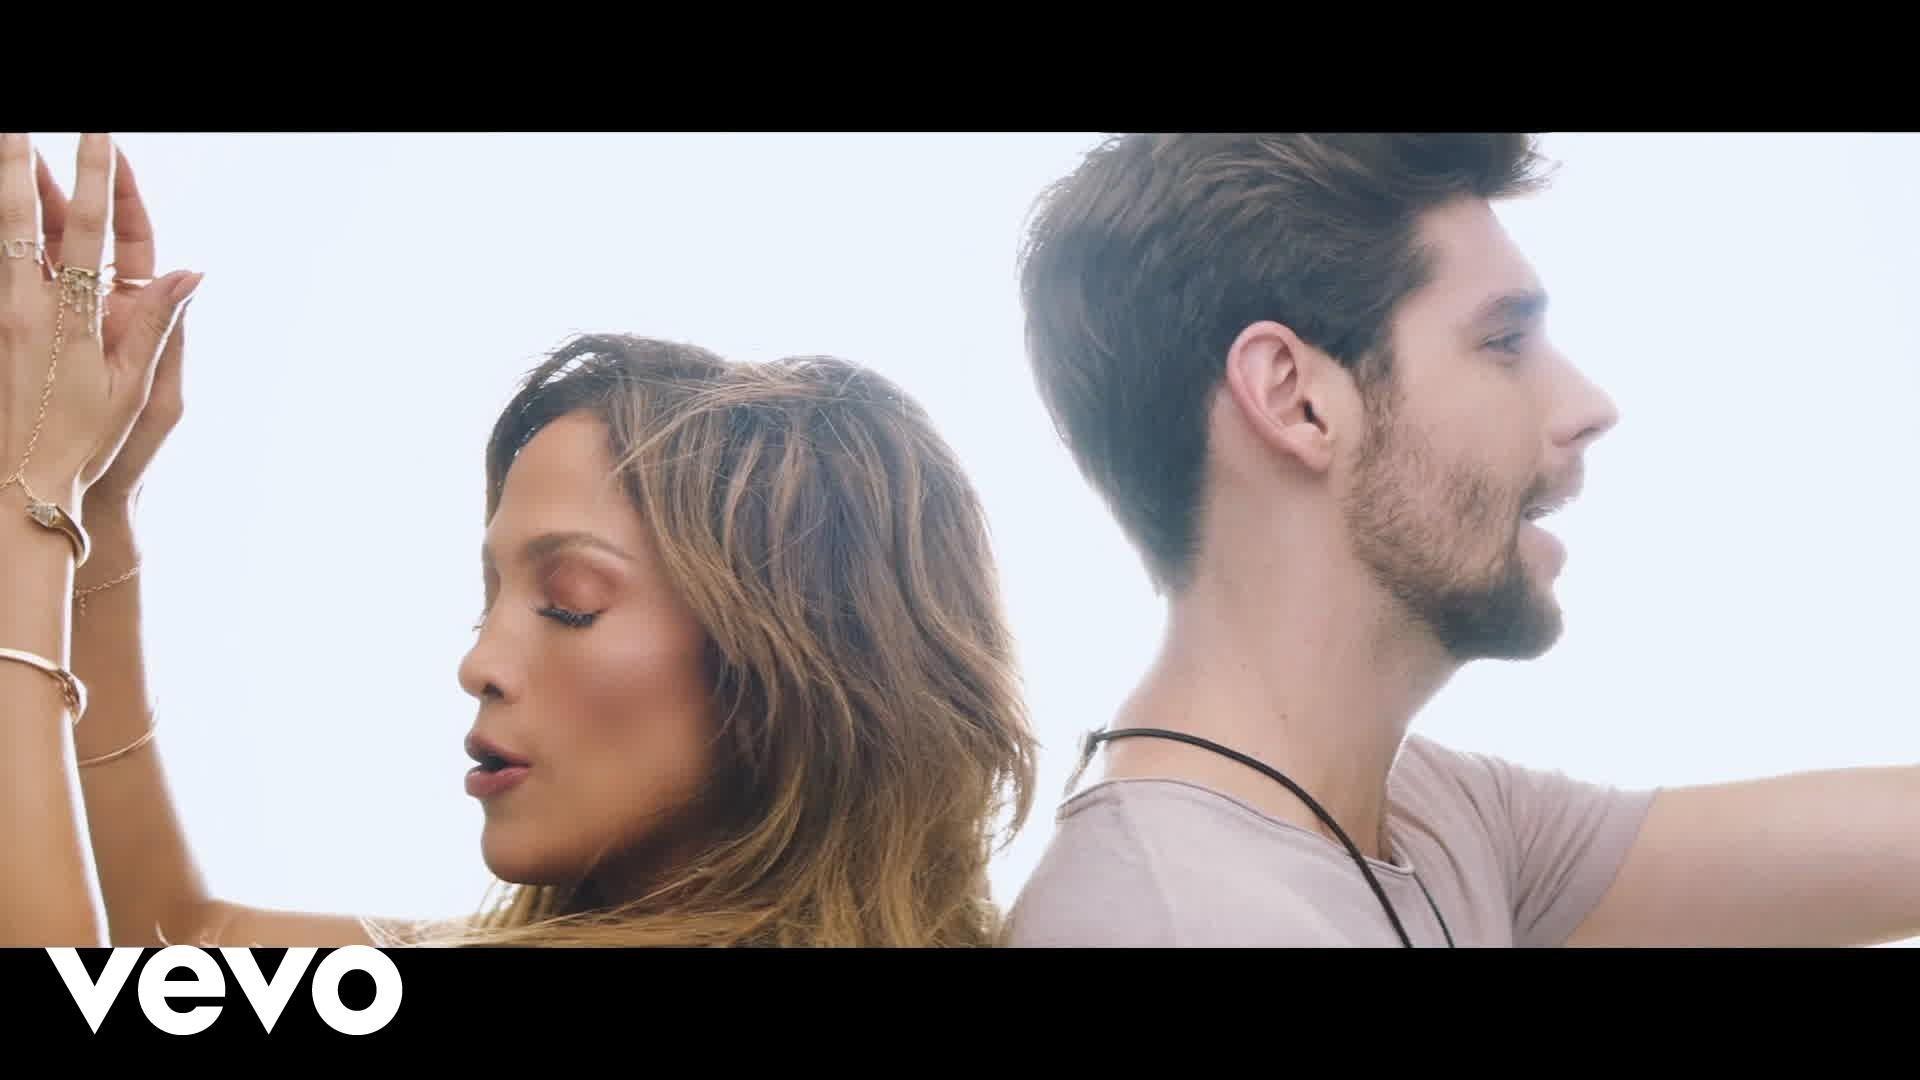 Alvaro Soler Feat Jennifer Lopez El Mismo Sol Under The Same Sun Brandnew B Case Remix The Single Available On D Jennifer Lopez Beautiful Songs Remix